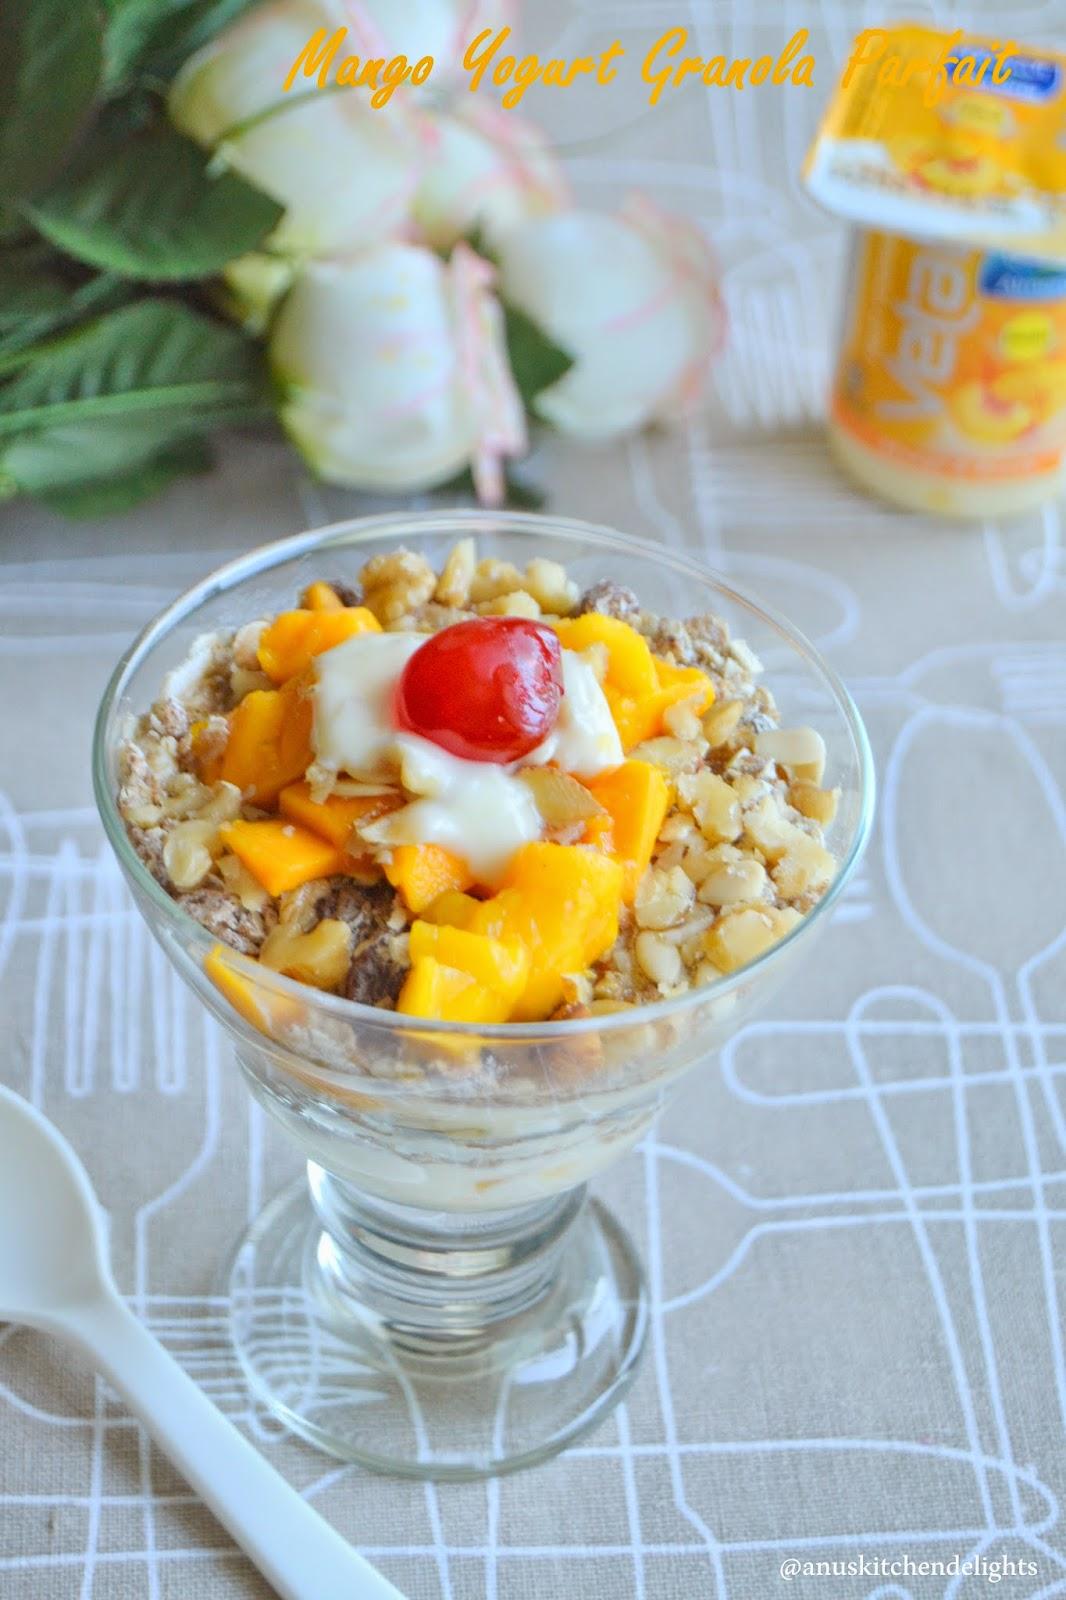 Mango Yogurt Granola Parfait